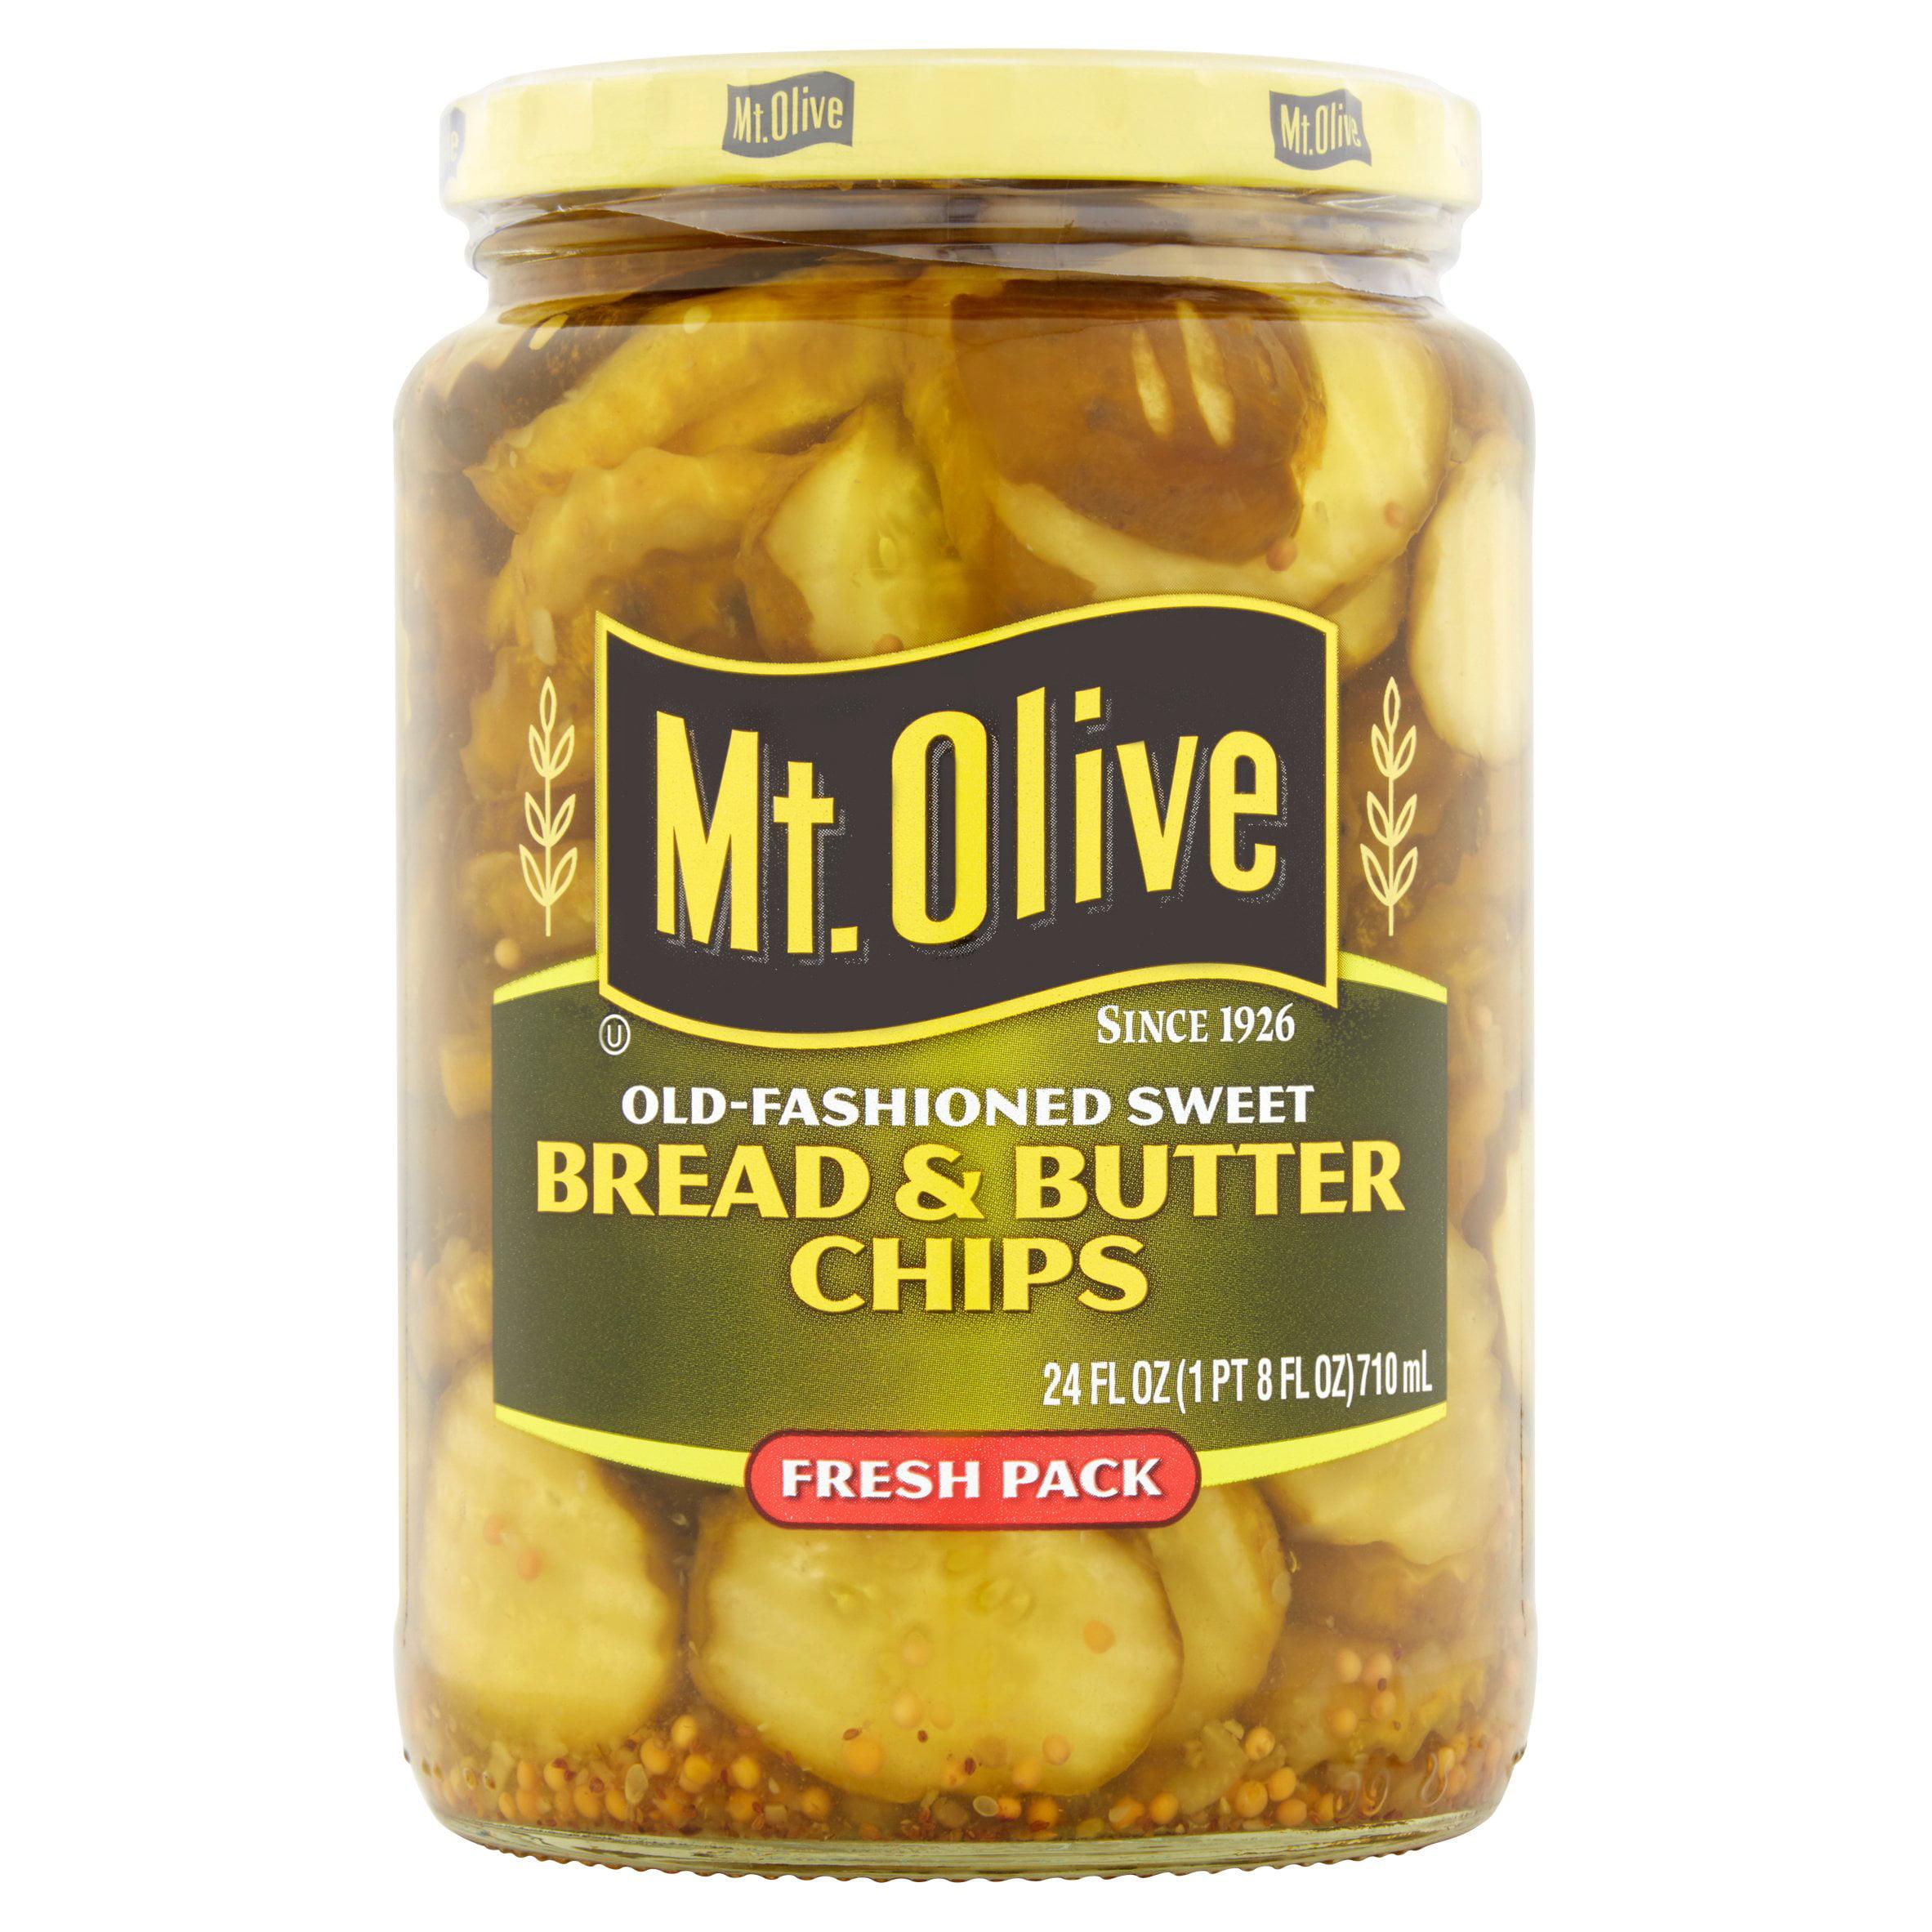 Mt. Olive Bread & Butter Chips Old Fashioned Sweet Fresh Pack Pickles 24 fl. oz. Jar by Mt. Olive Pickle Company, Inc. / Corner of Cucumber & Vine